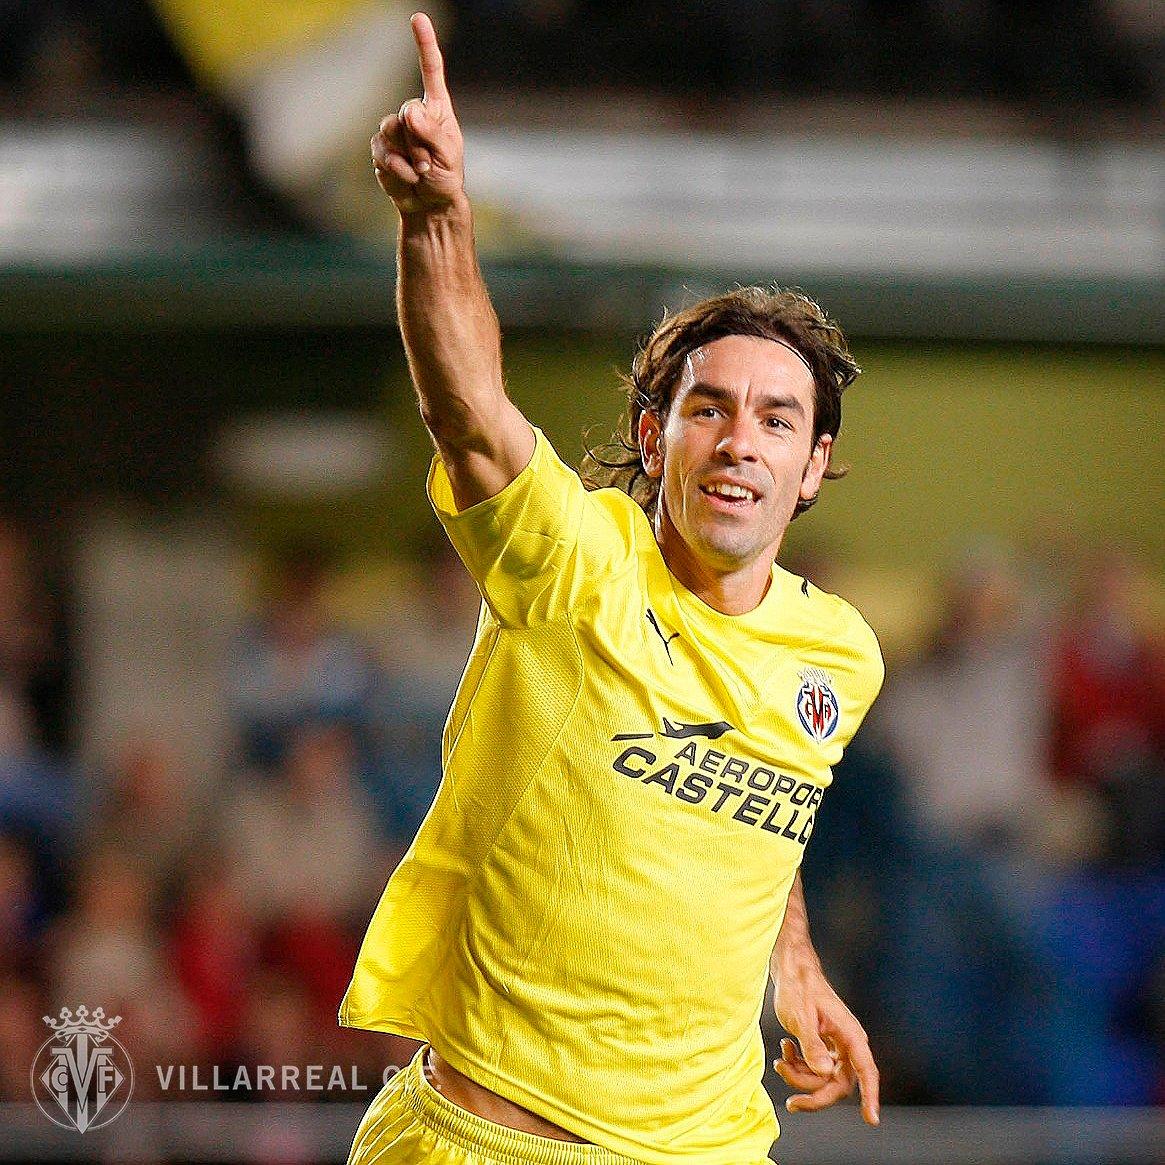 1️⃣2️⃣9️⃣ matches 1️⃣8️⃣ goals 🏆 World Cup and Euro champion 🎩 @piresrobert7 🎩 villarrealcf.es/en/news/item/2…